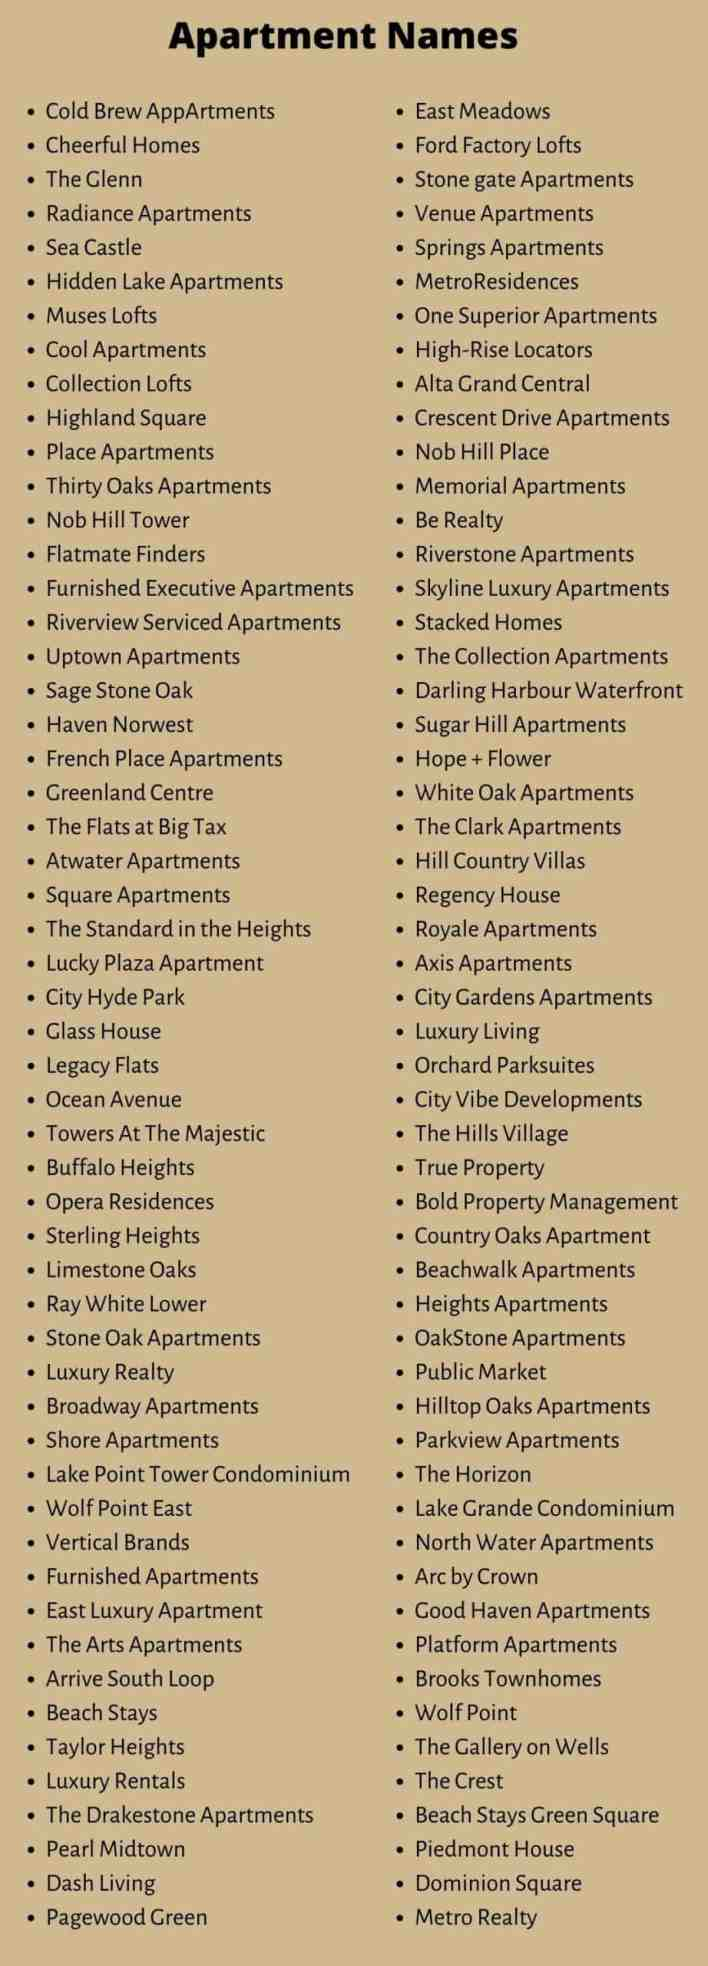 Apartment Names